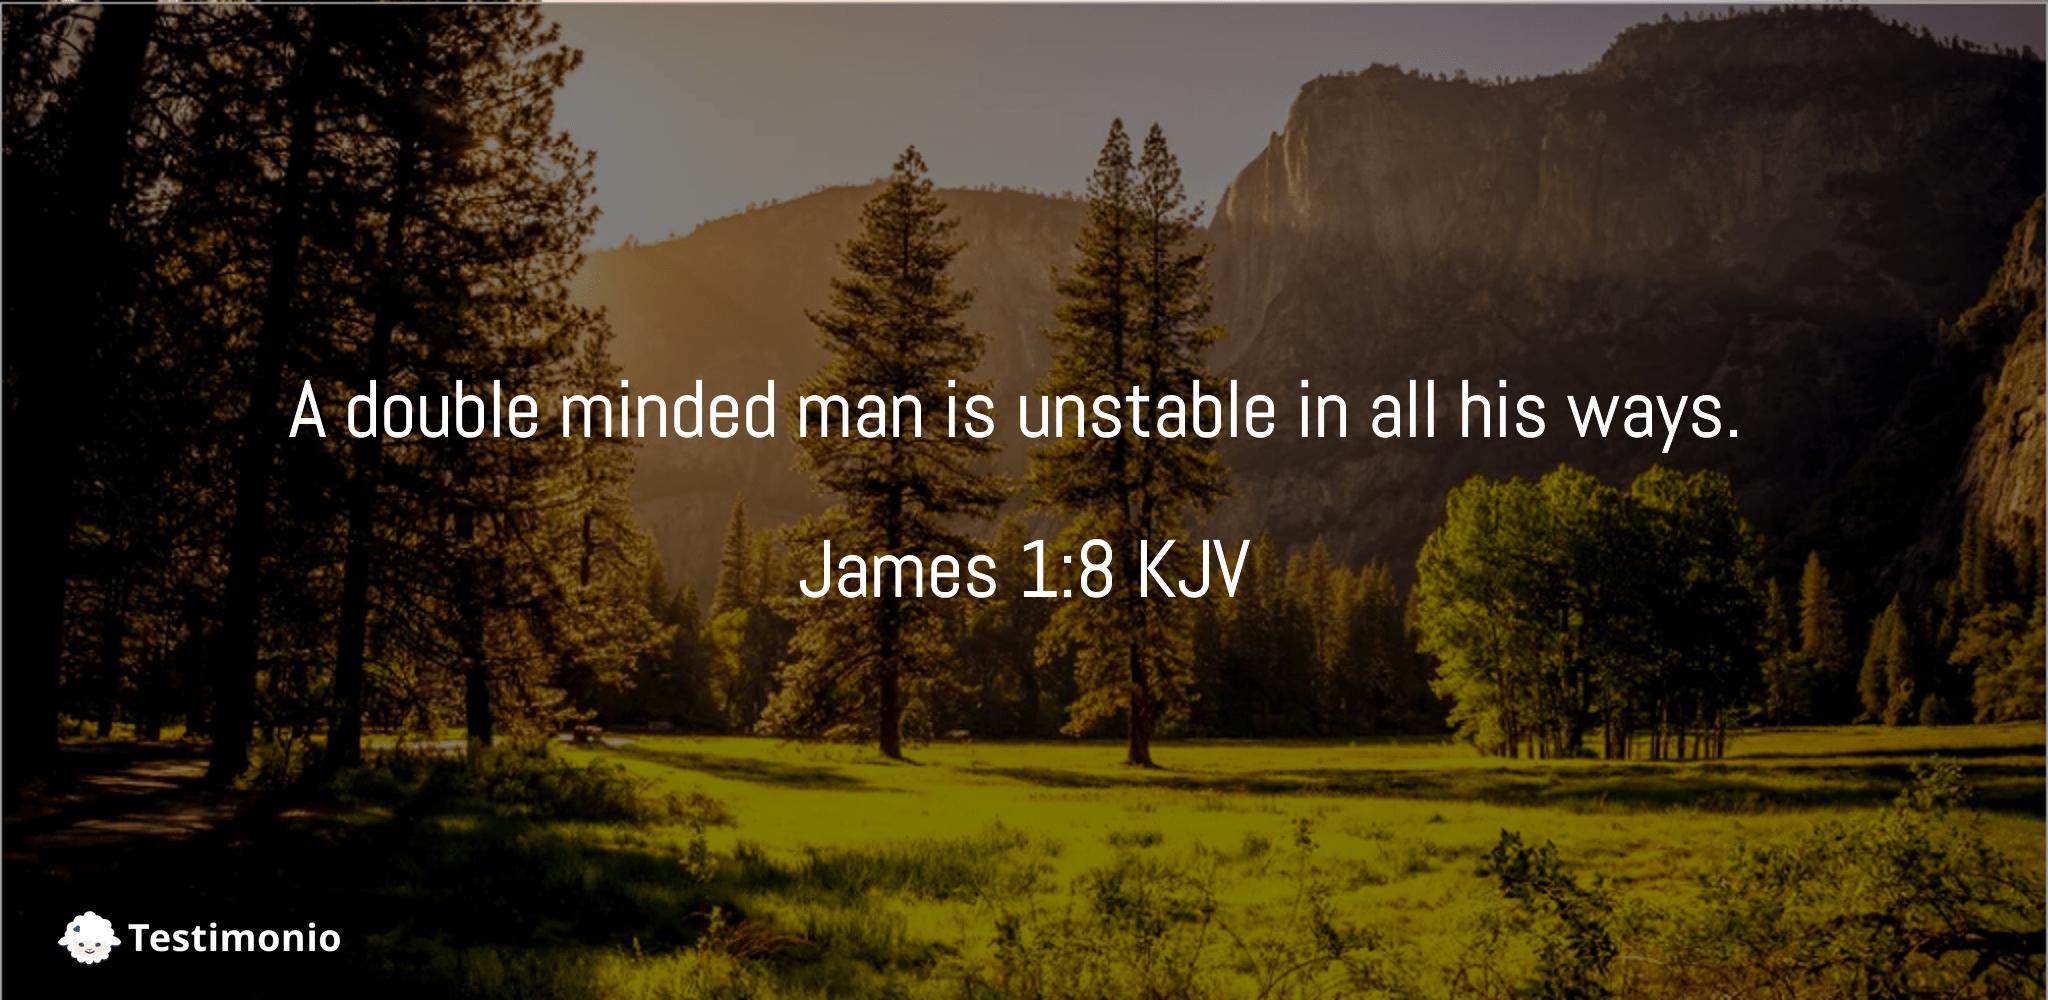 James 1:8